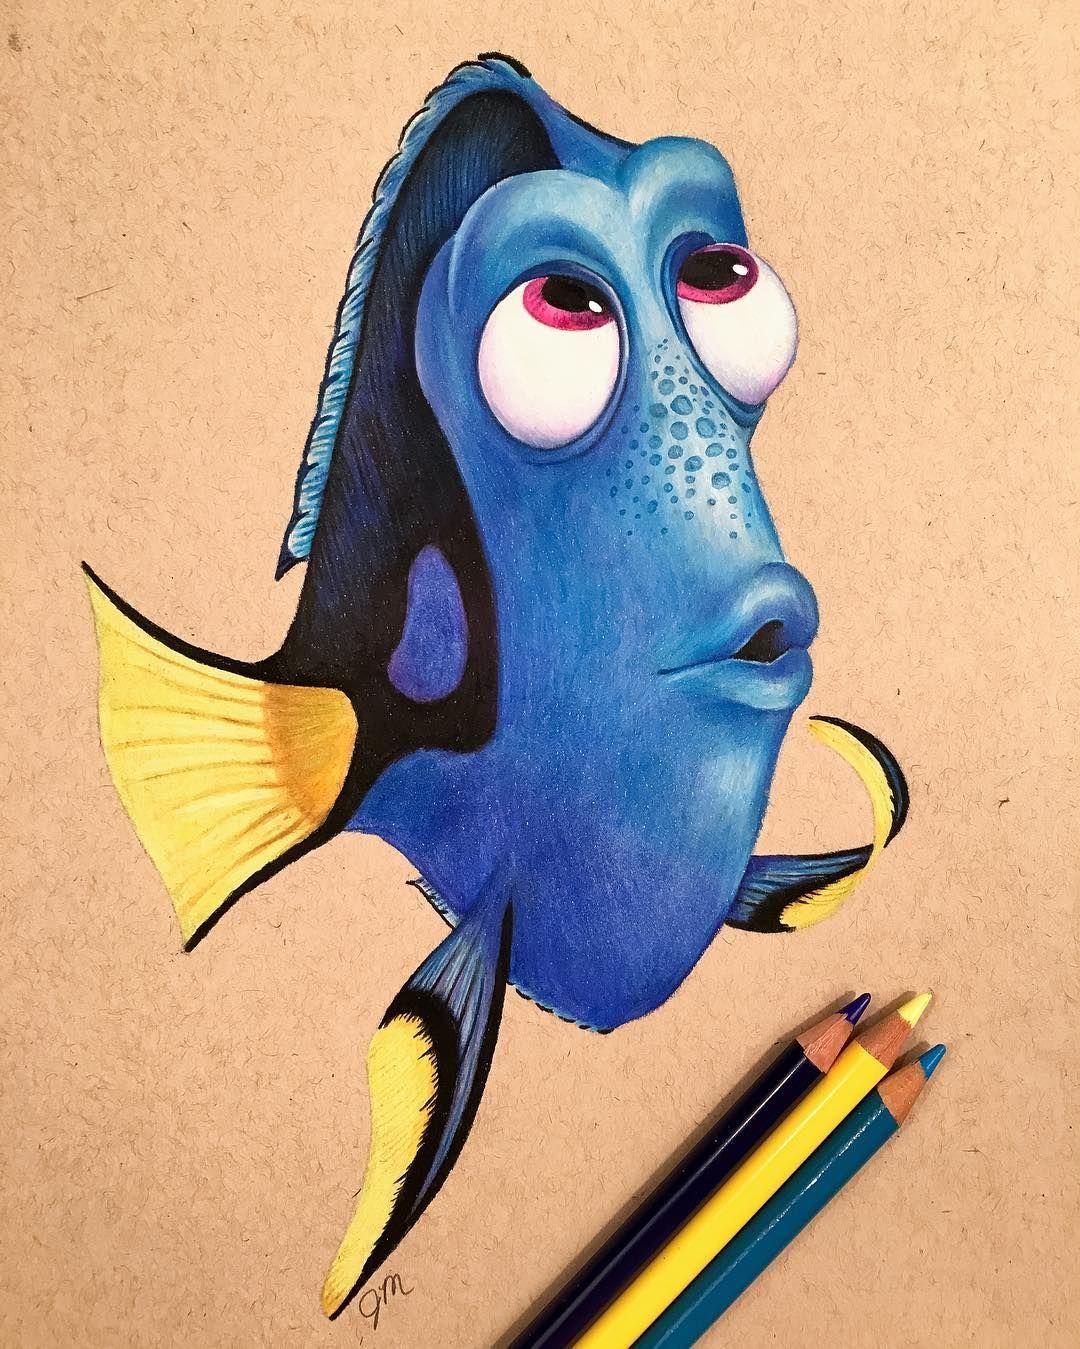 Excellent color pencil drawings by julianna maston funpalstudio art artist artwork entertainment drawings beautiful creativity illustration